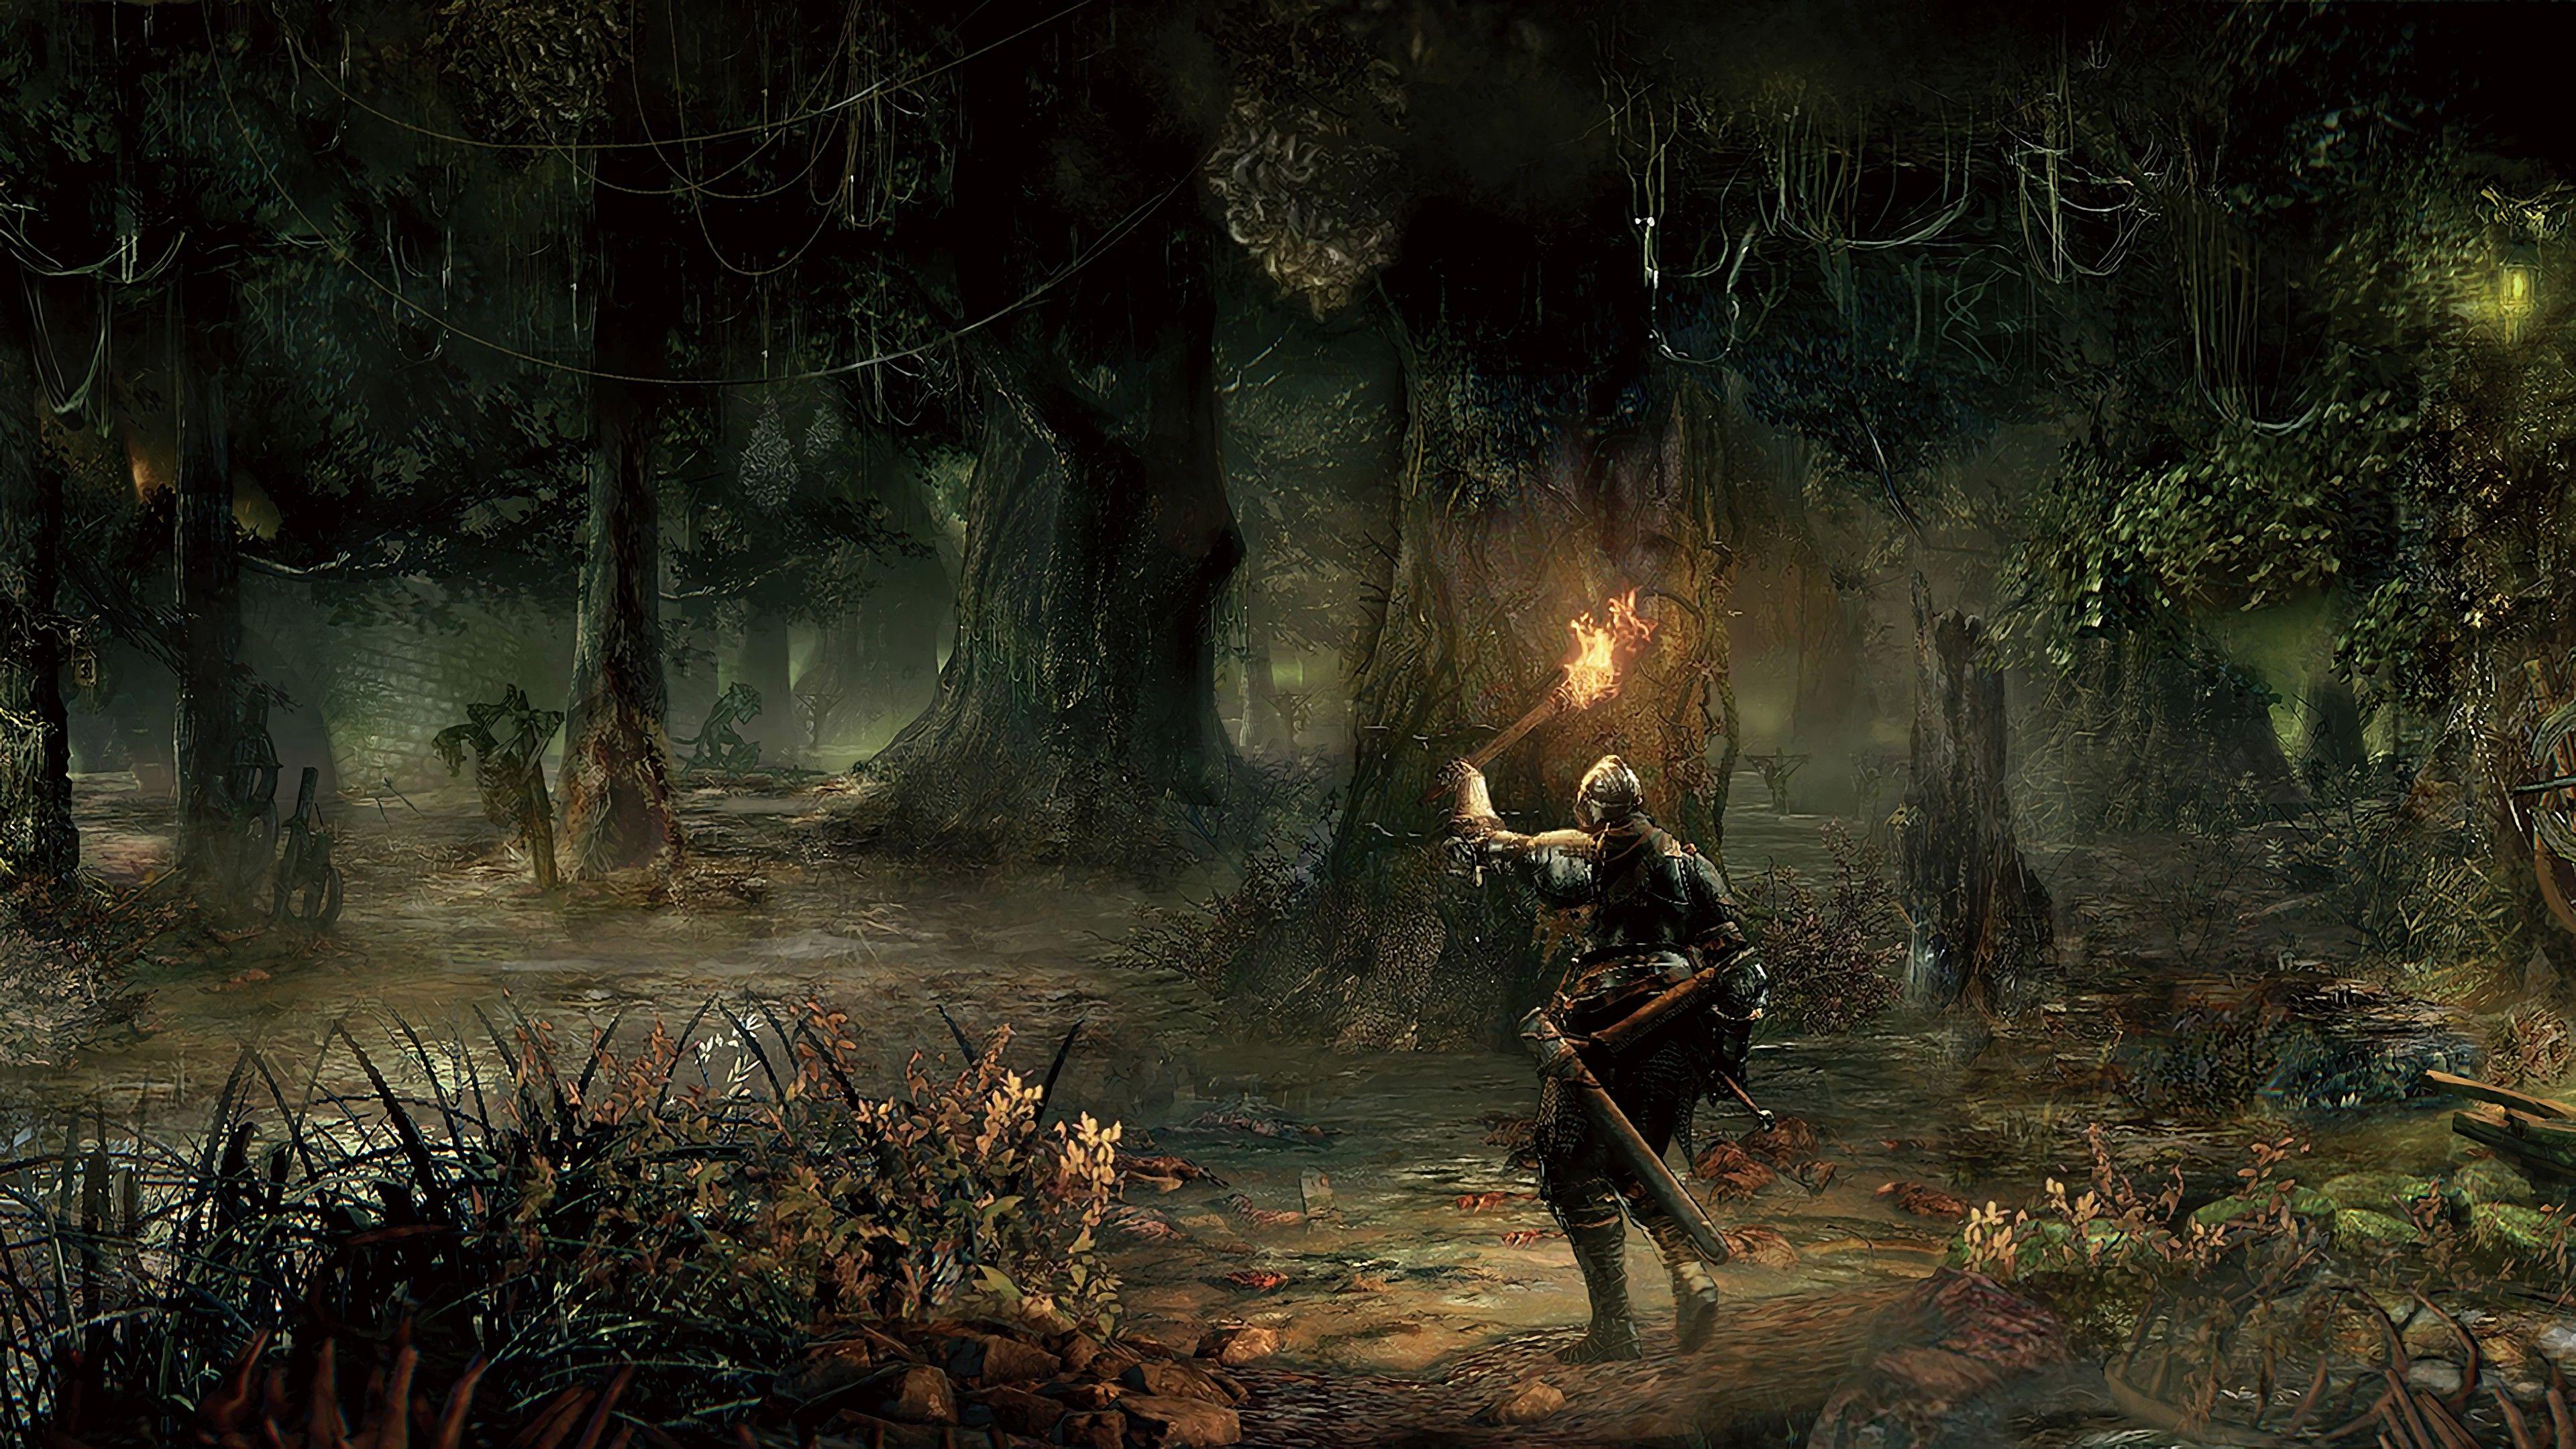 Dark Souls 3 Game Art Xbox Games Wallpapers Ps Games Wallpapers Pc Games Wallpapers Games Wallpapers Dark Soul Dark Souls Wallpaper Dark Souls Dark Souls 3